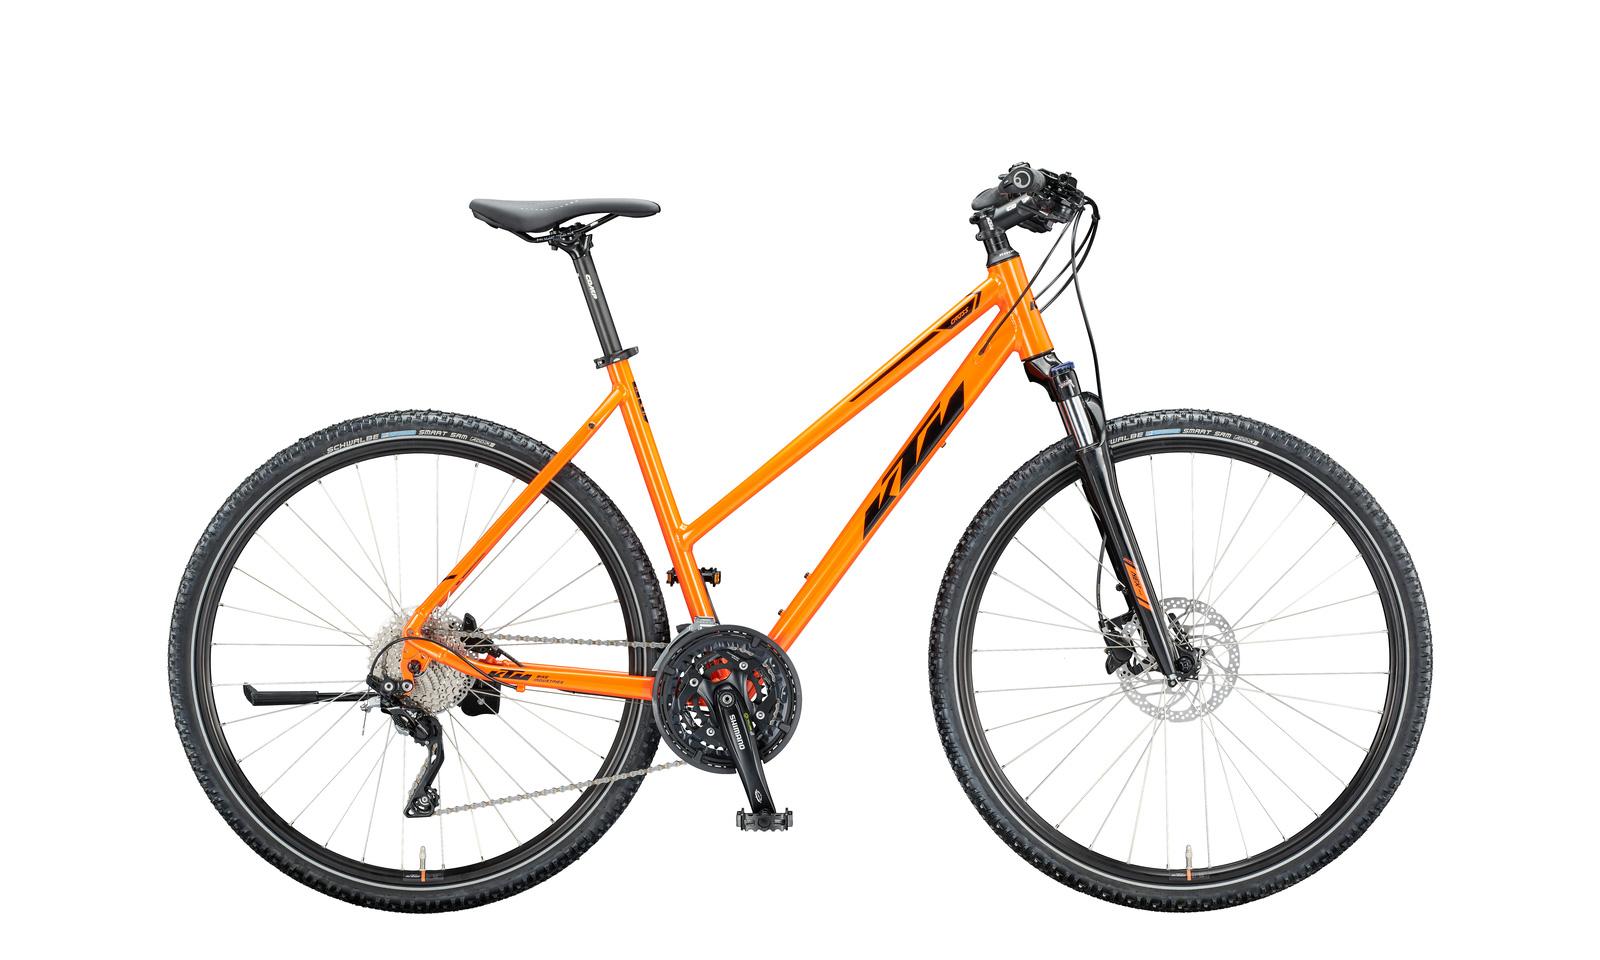 Biciclete KTM Trekking Offroad LIFE CROSS 3x10 Shimano Deore XT